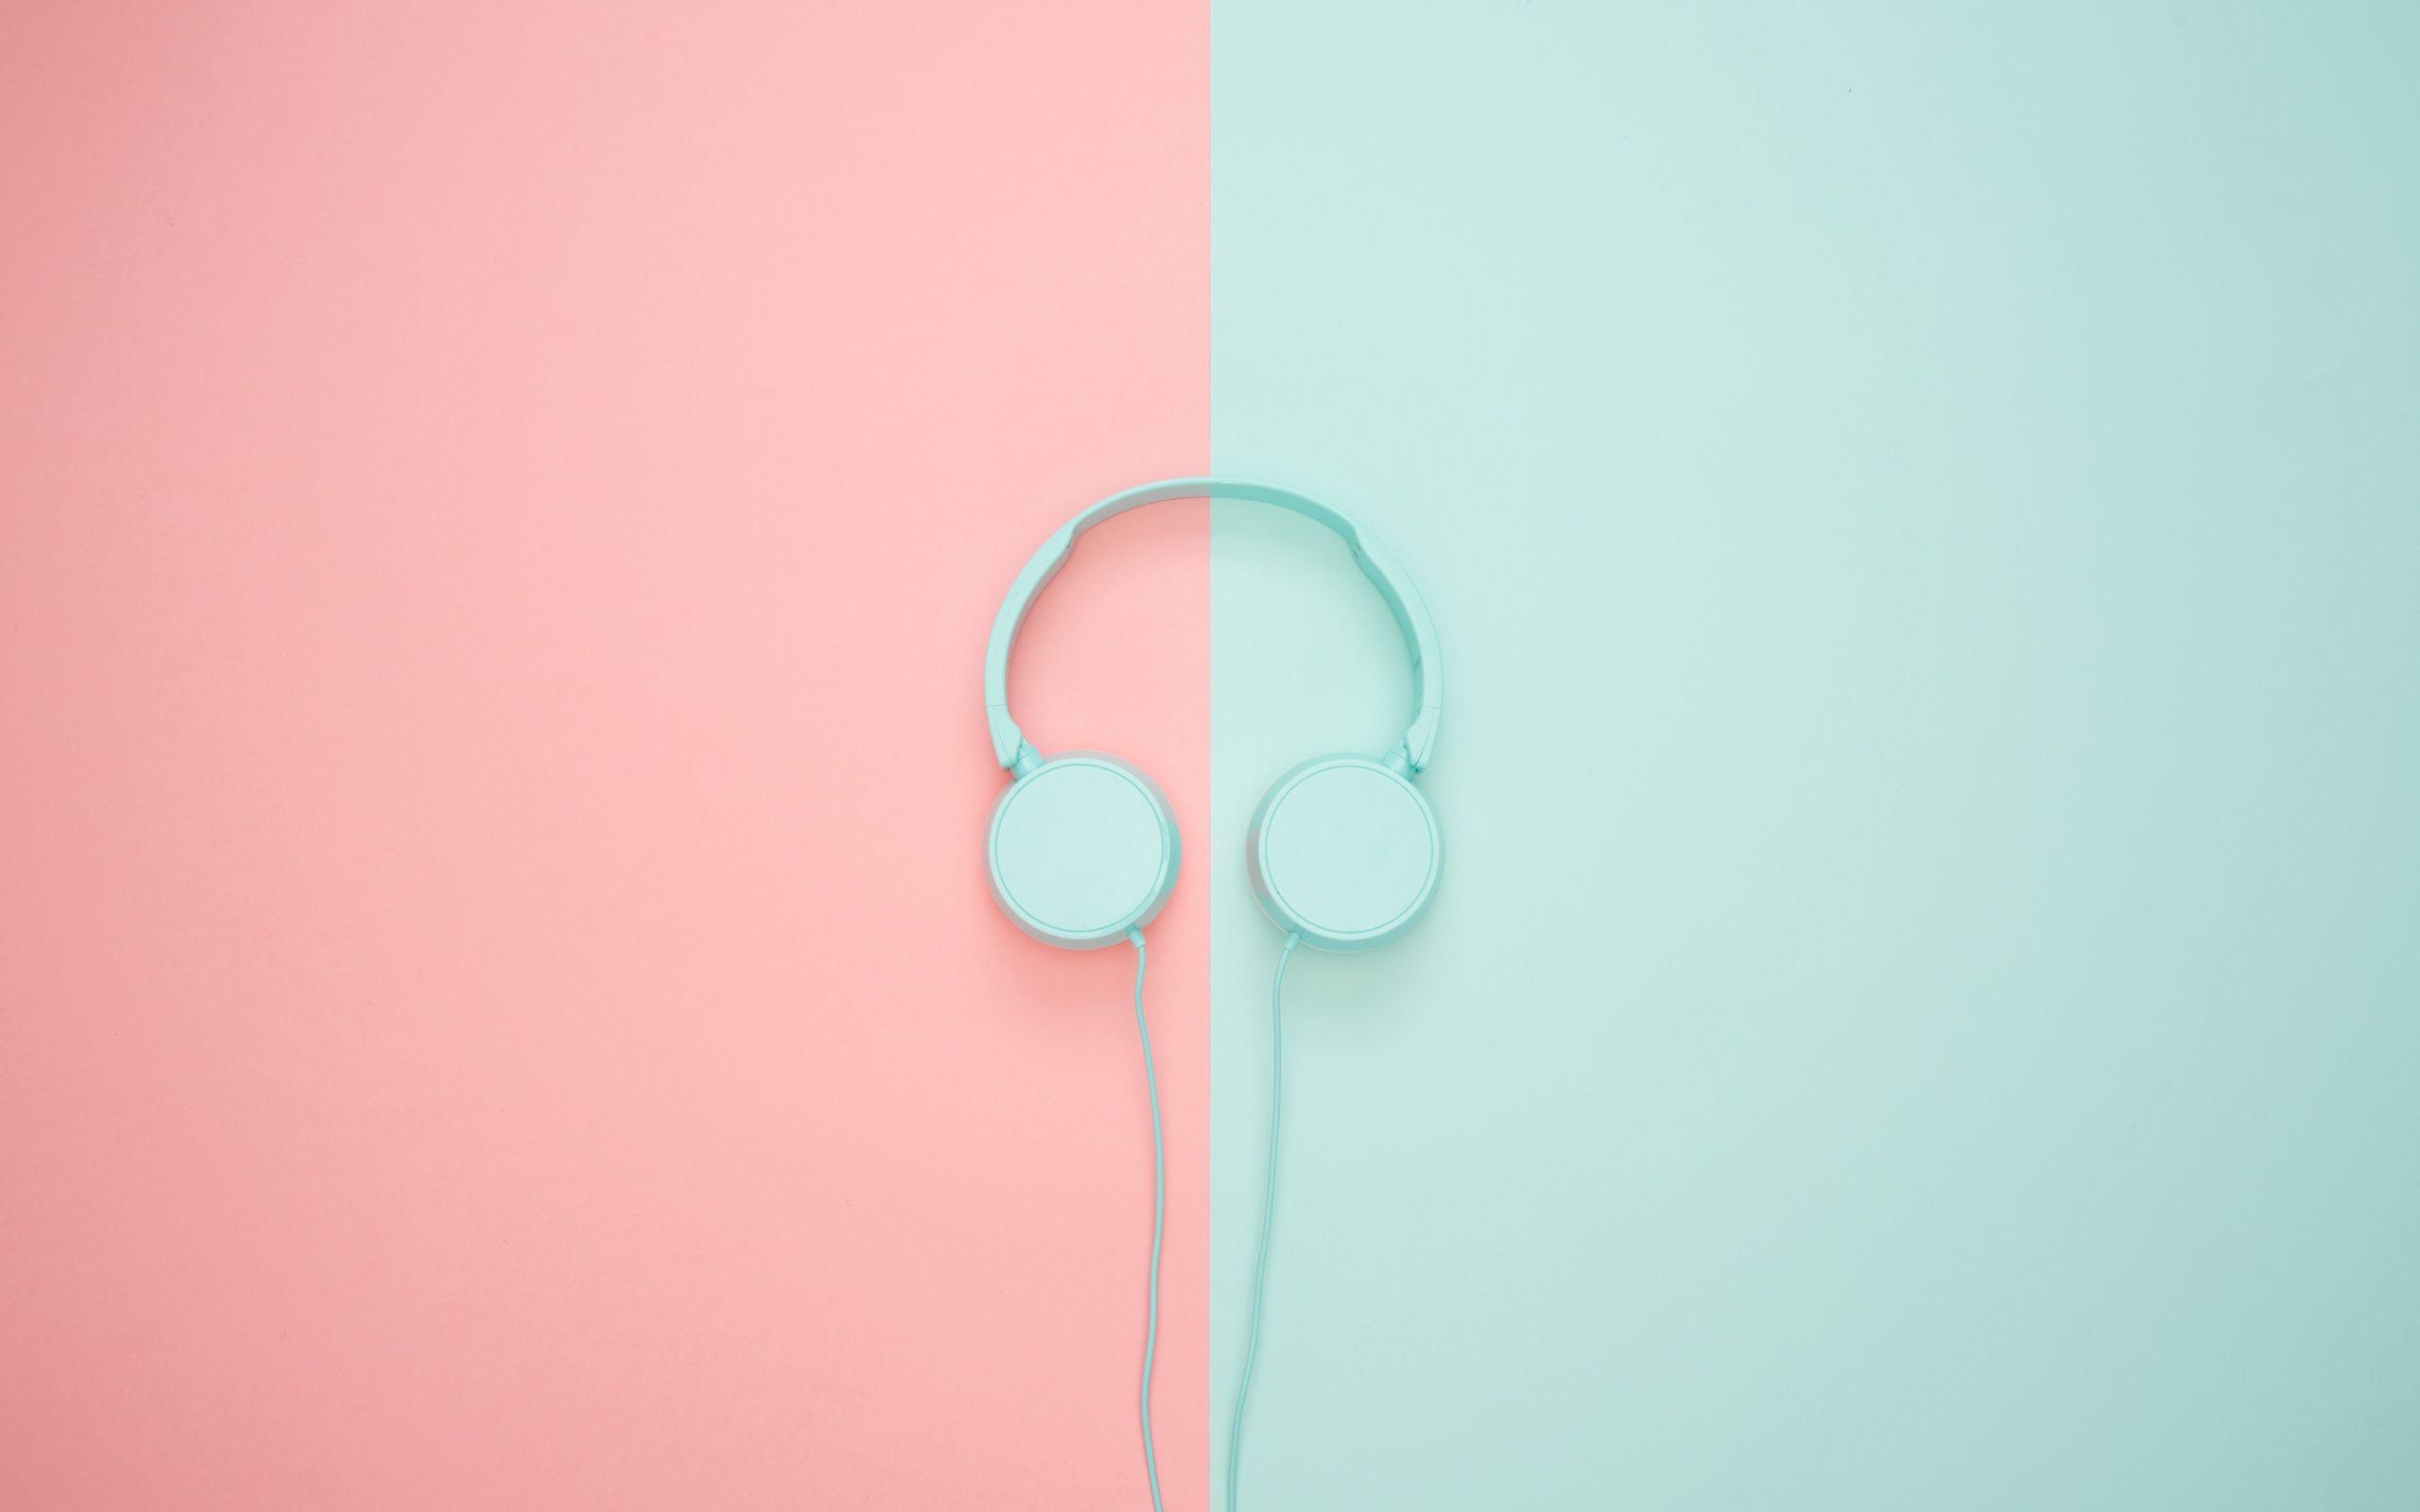 2560x1600 Wallpaper headphones, minimalism, pastel, pink